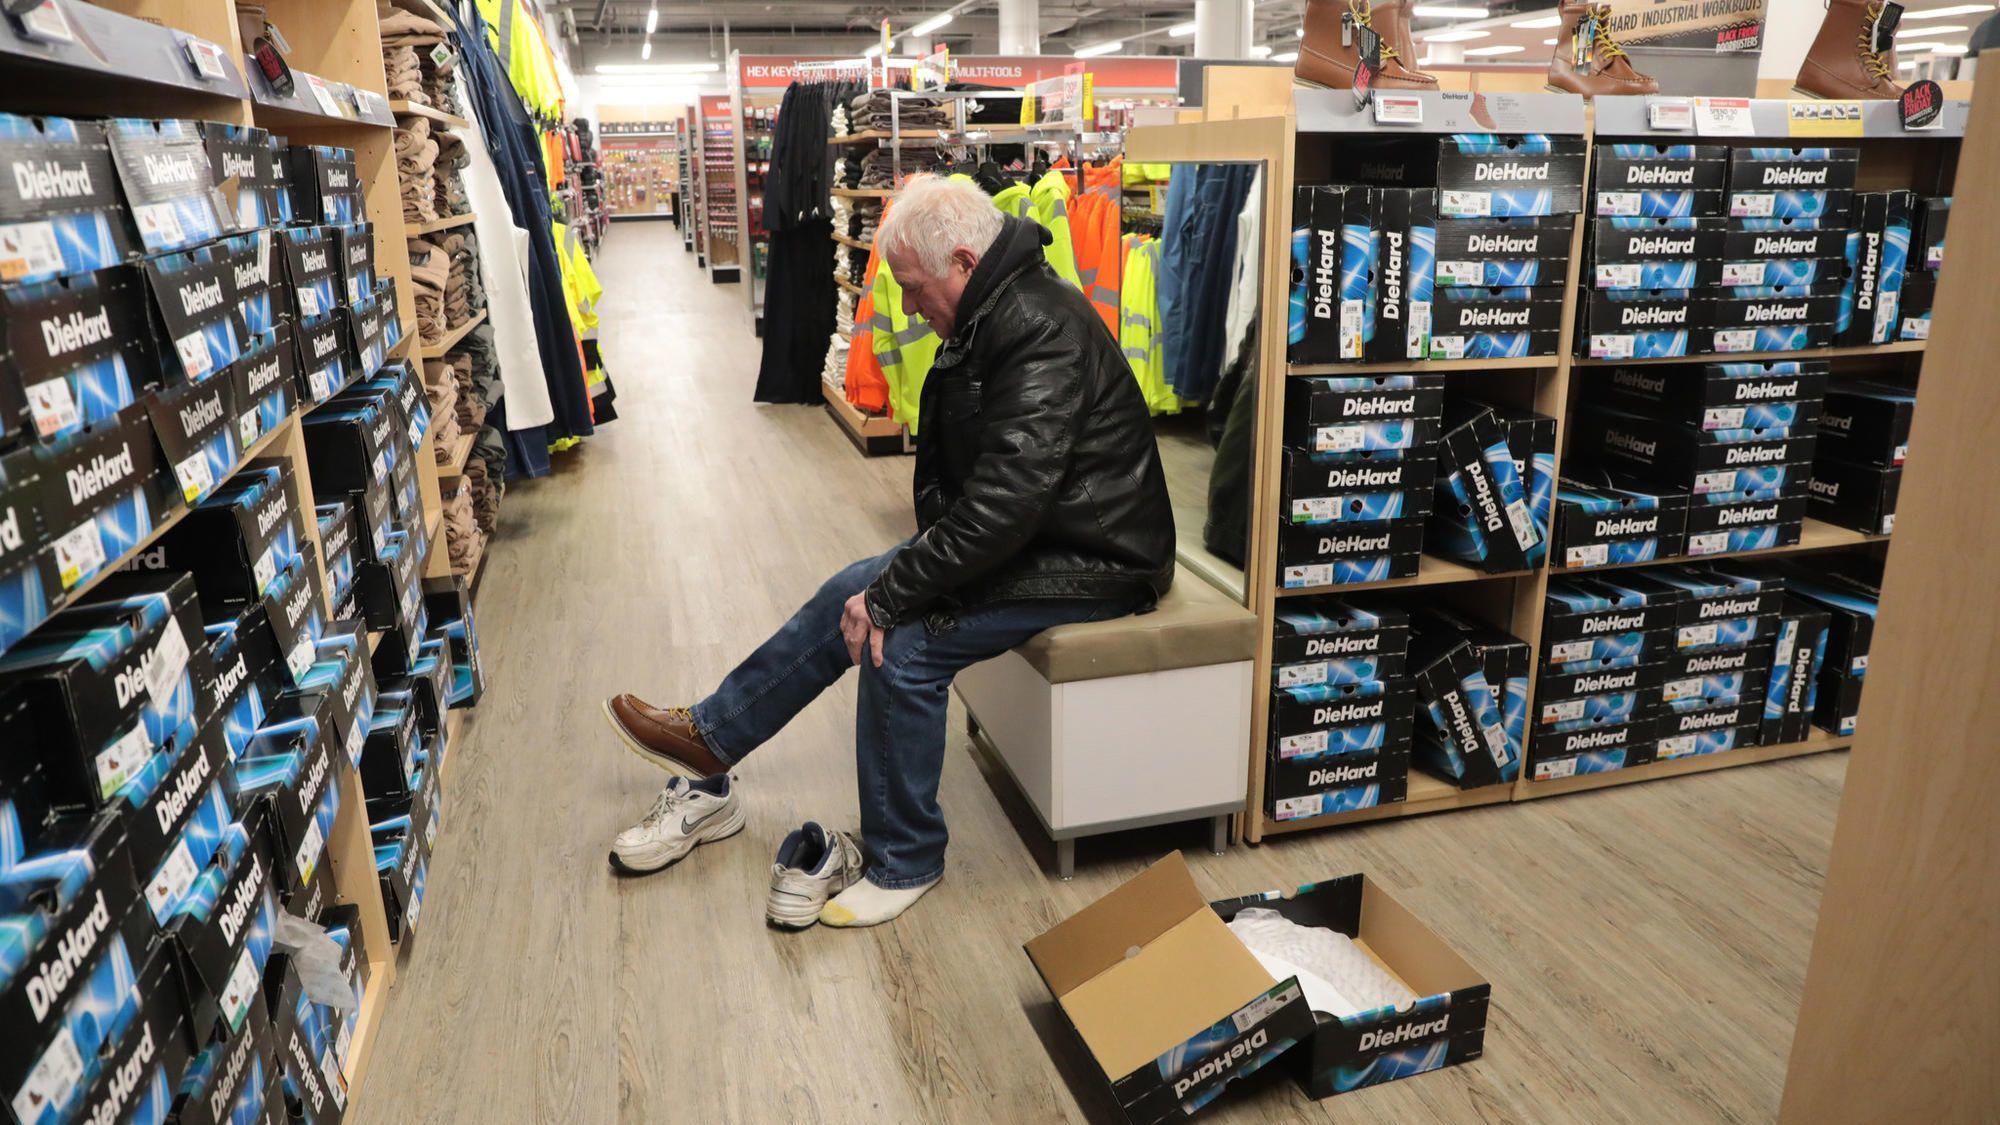 Sears On Black Friday: Stocked Shelves And Sentimental